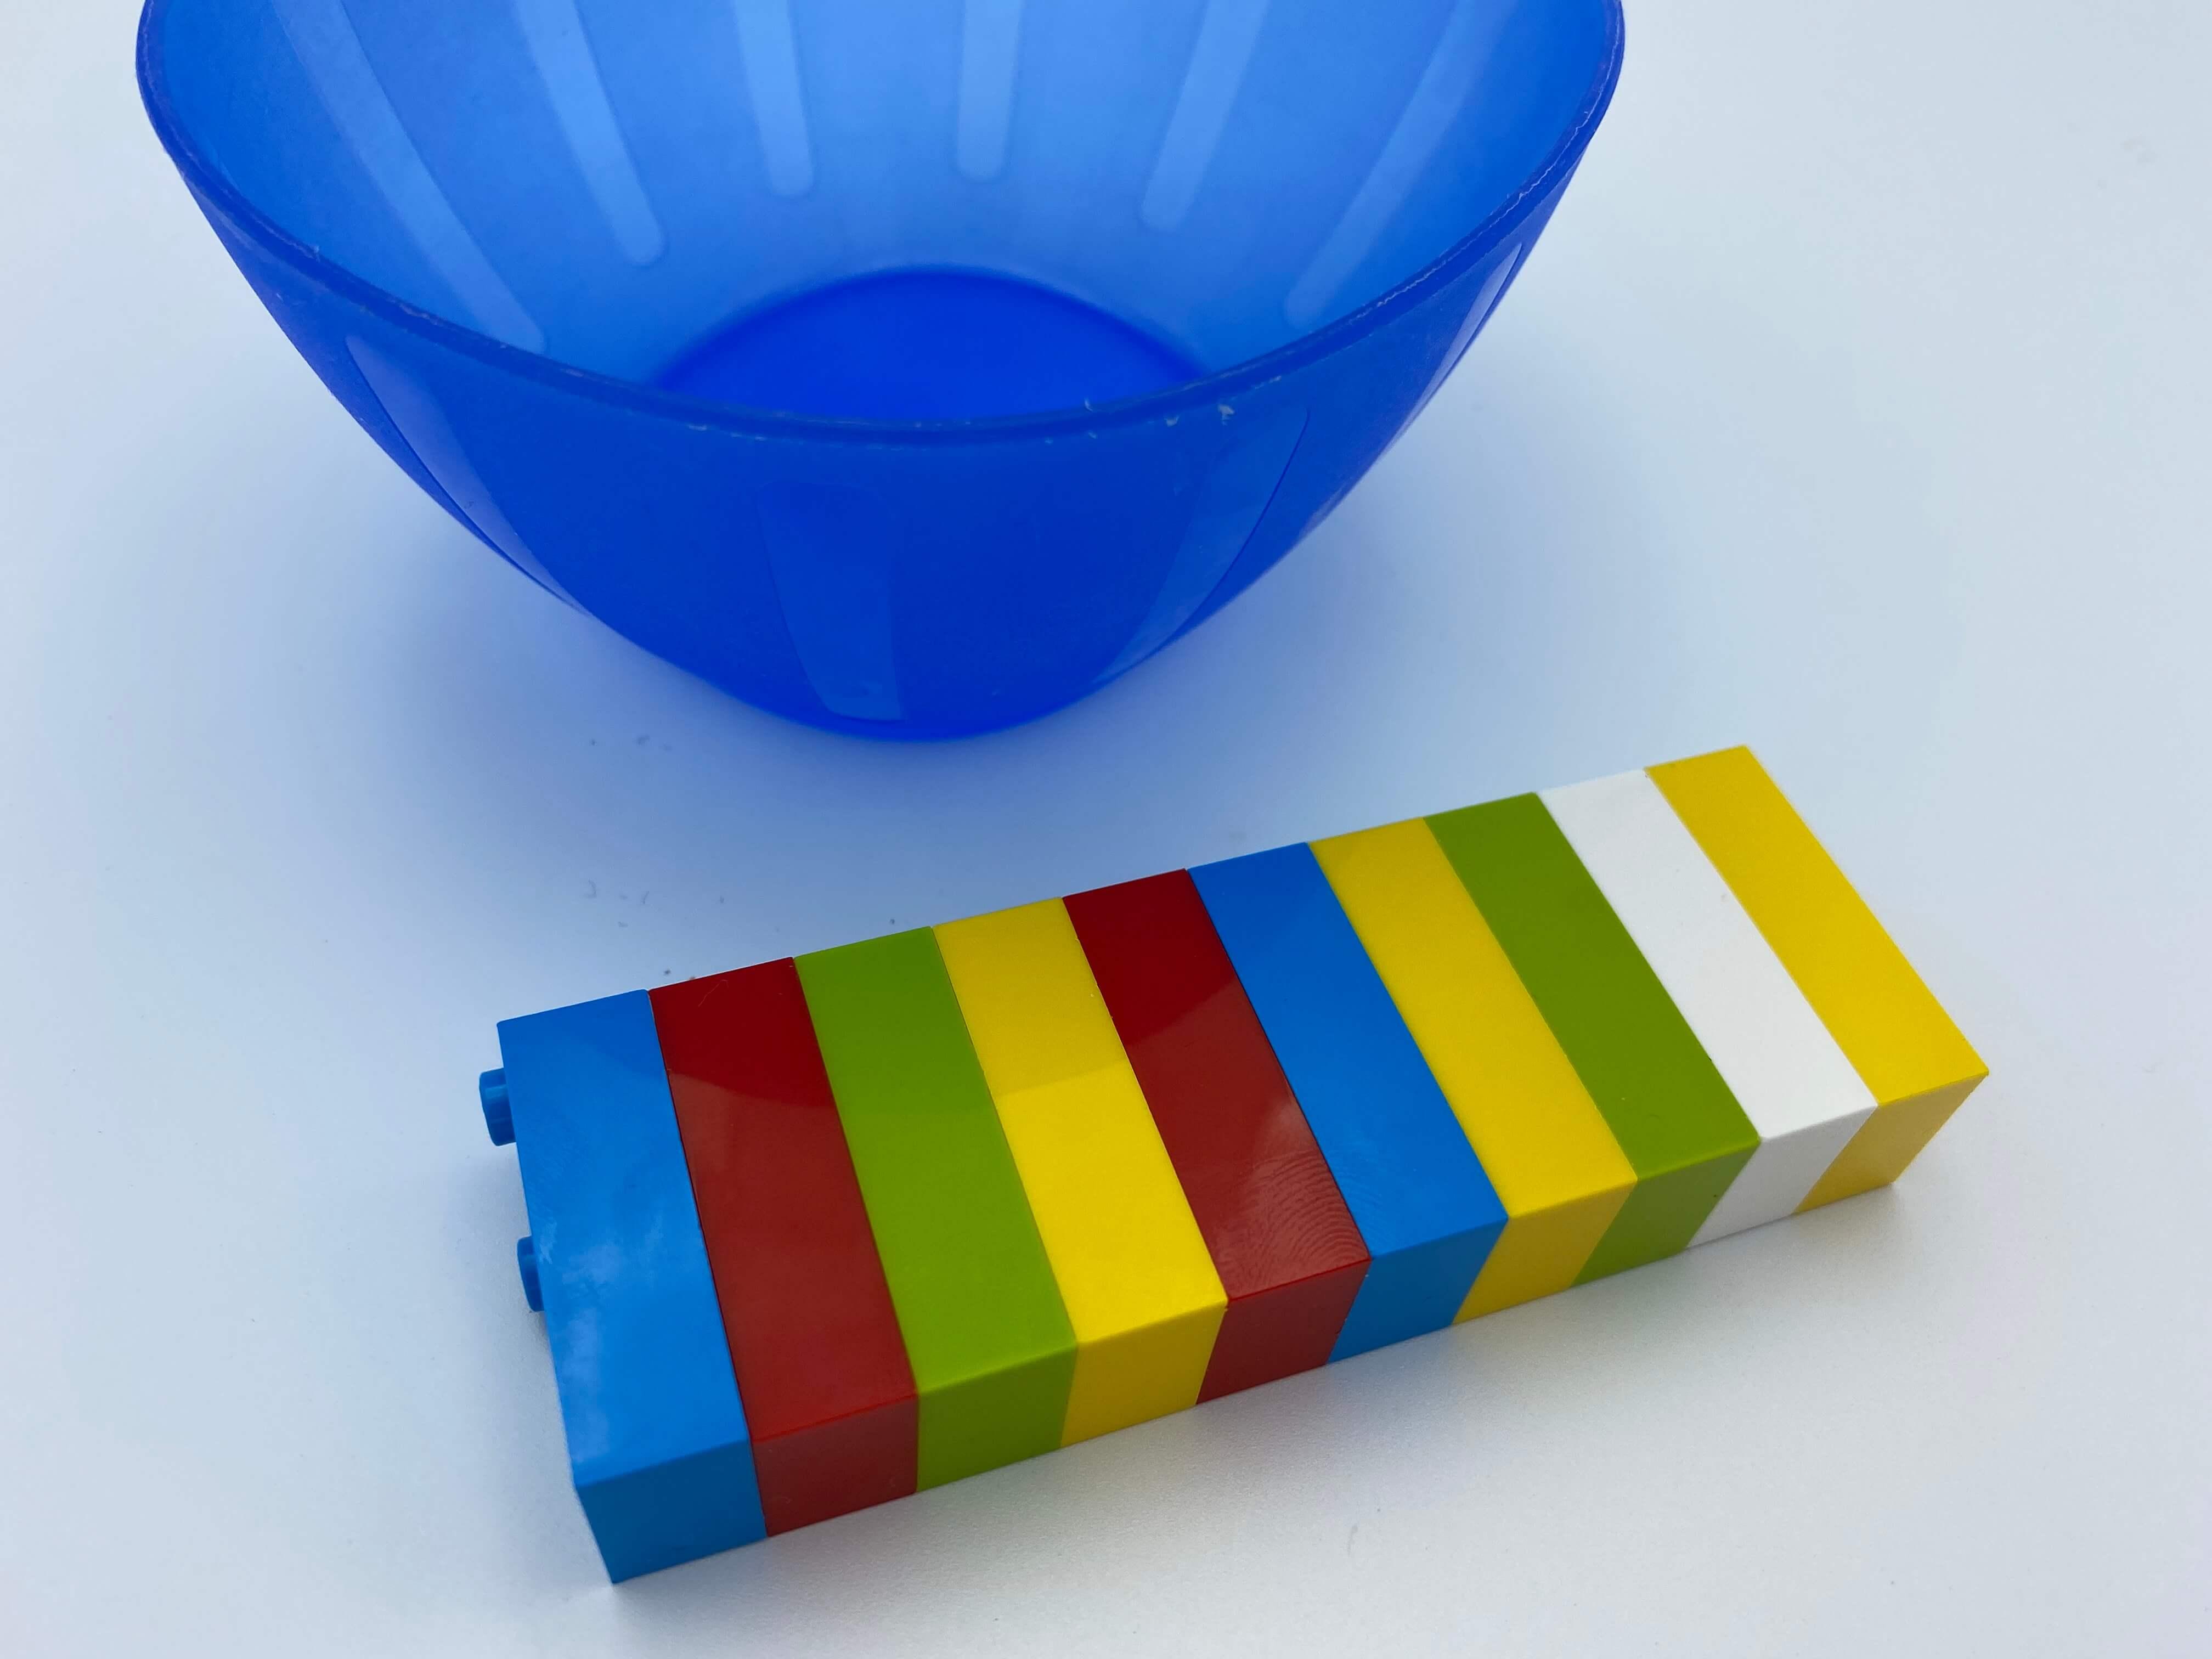 10 bricks attached, an empty bowl.